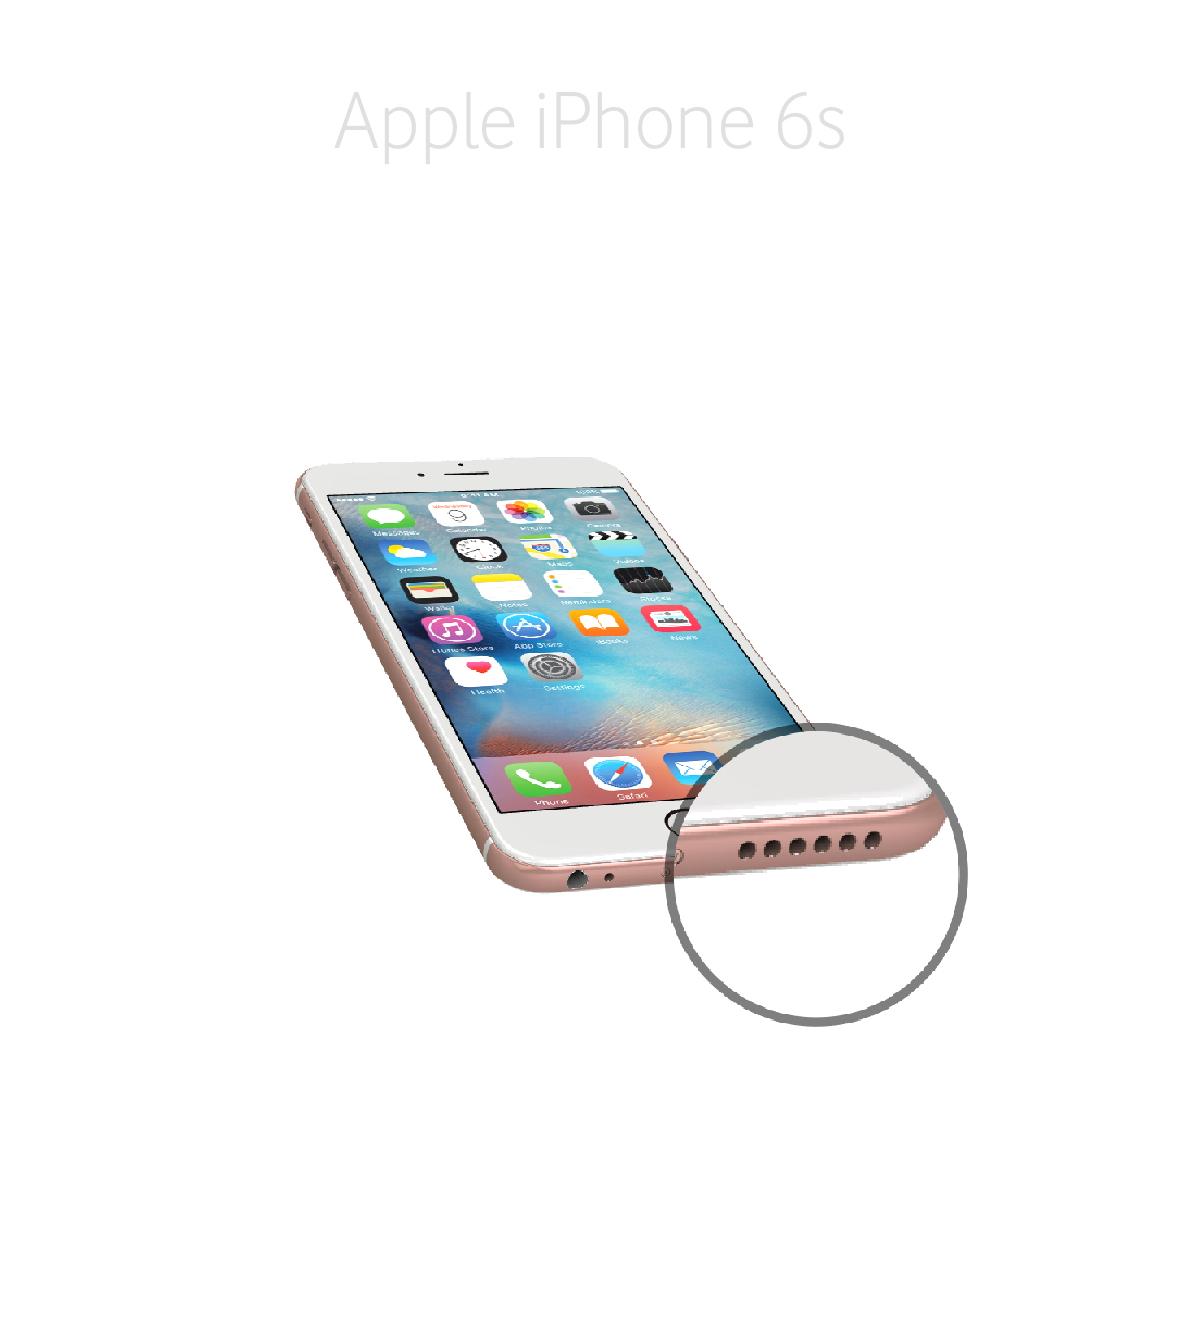 Laga högtalare iPhone 6s